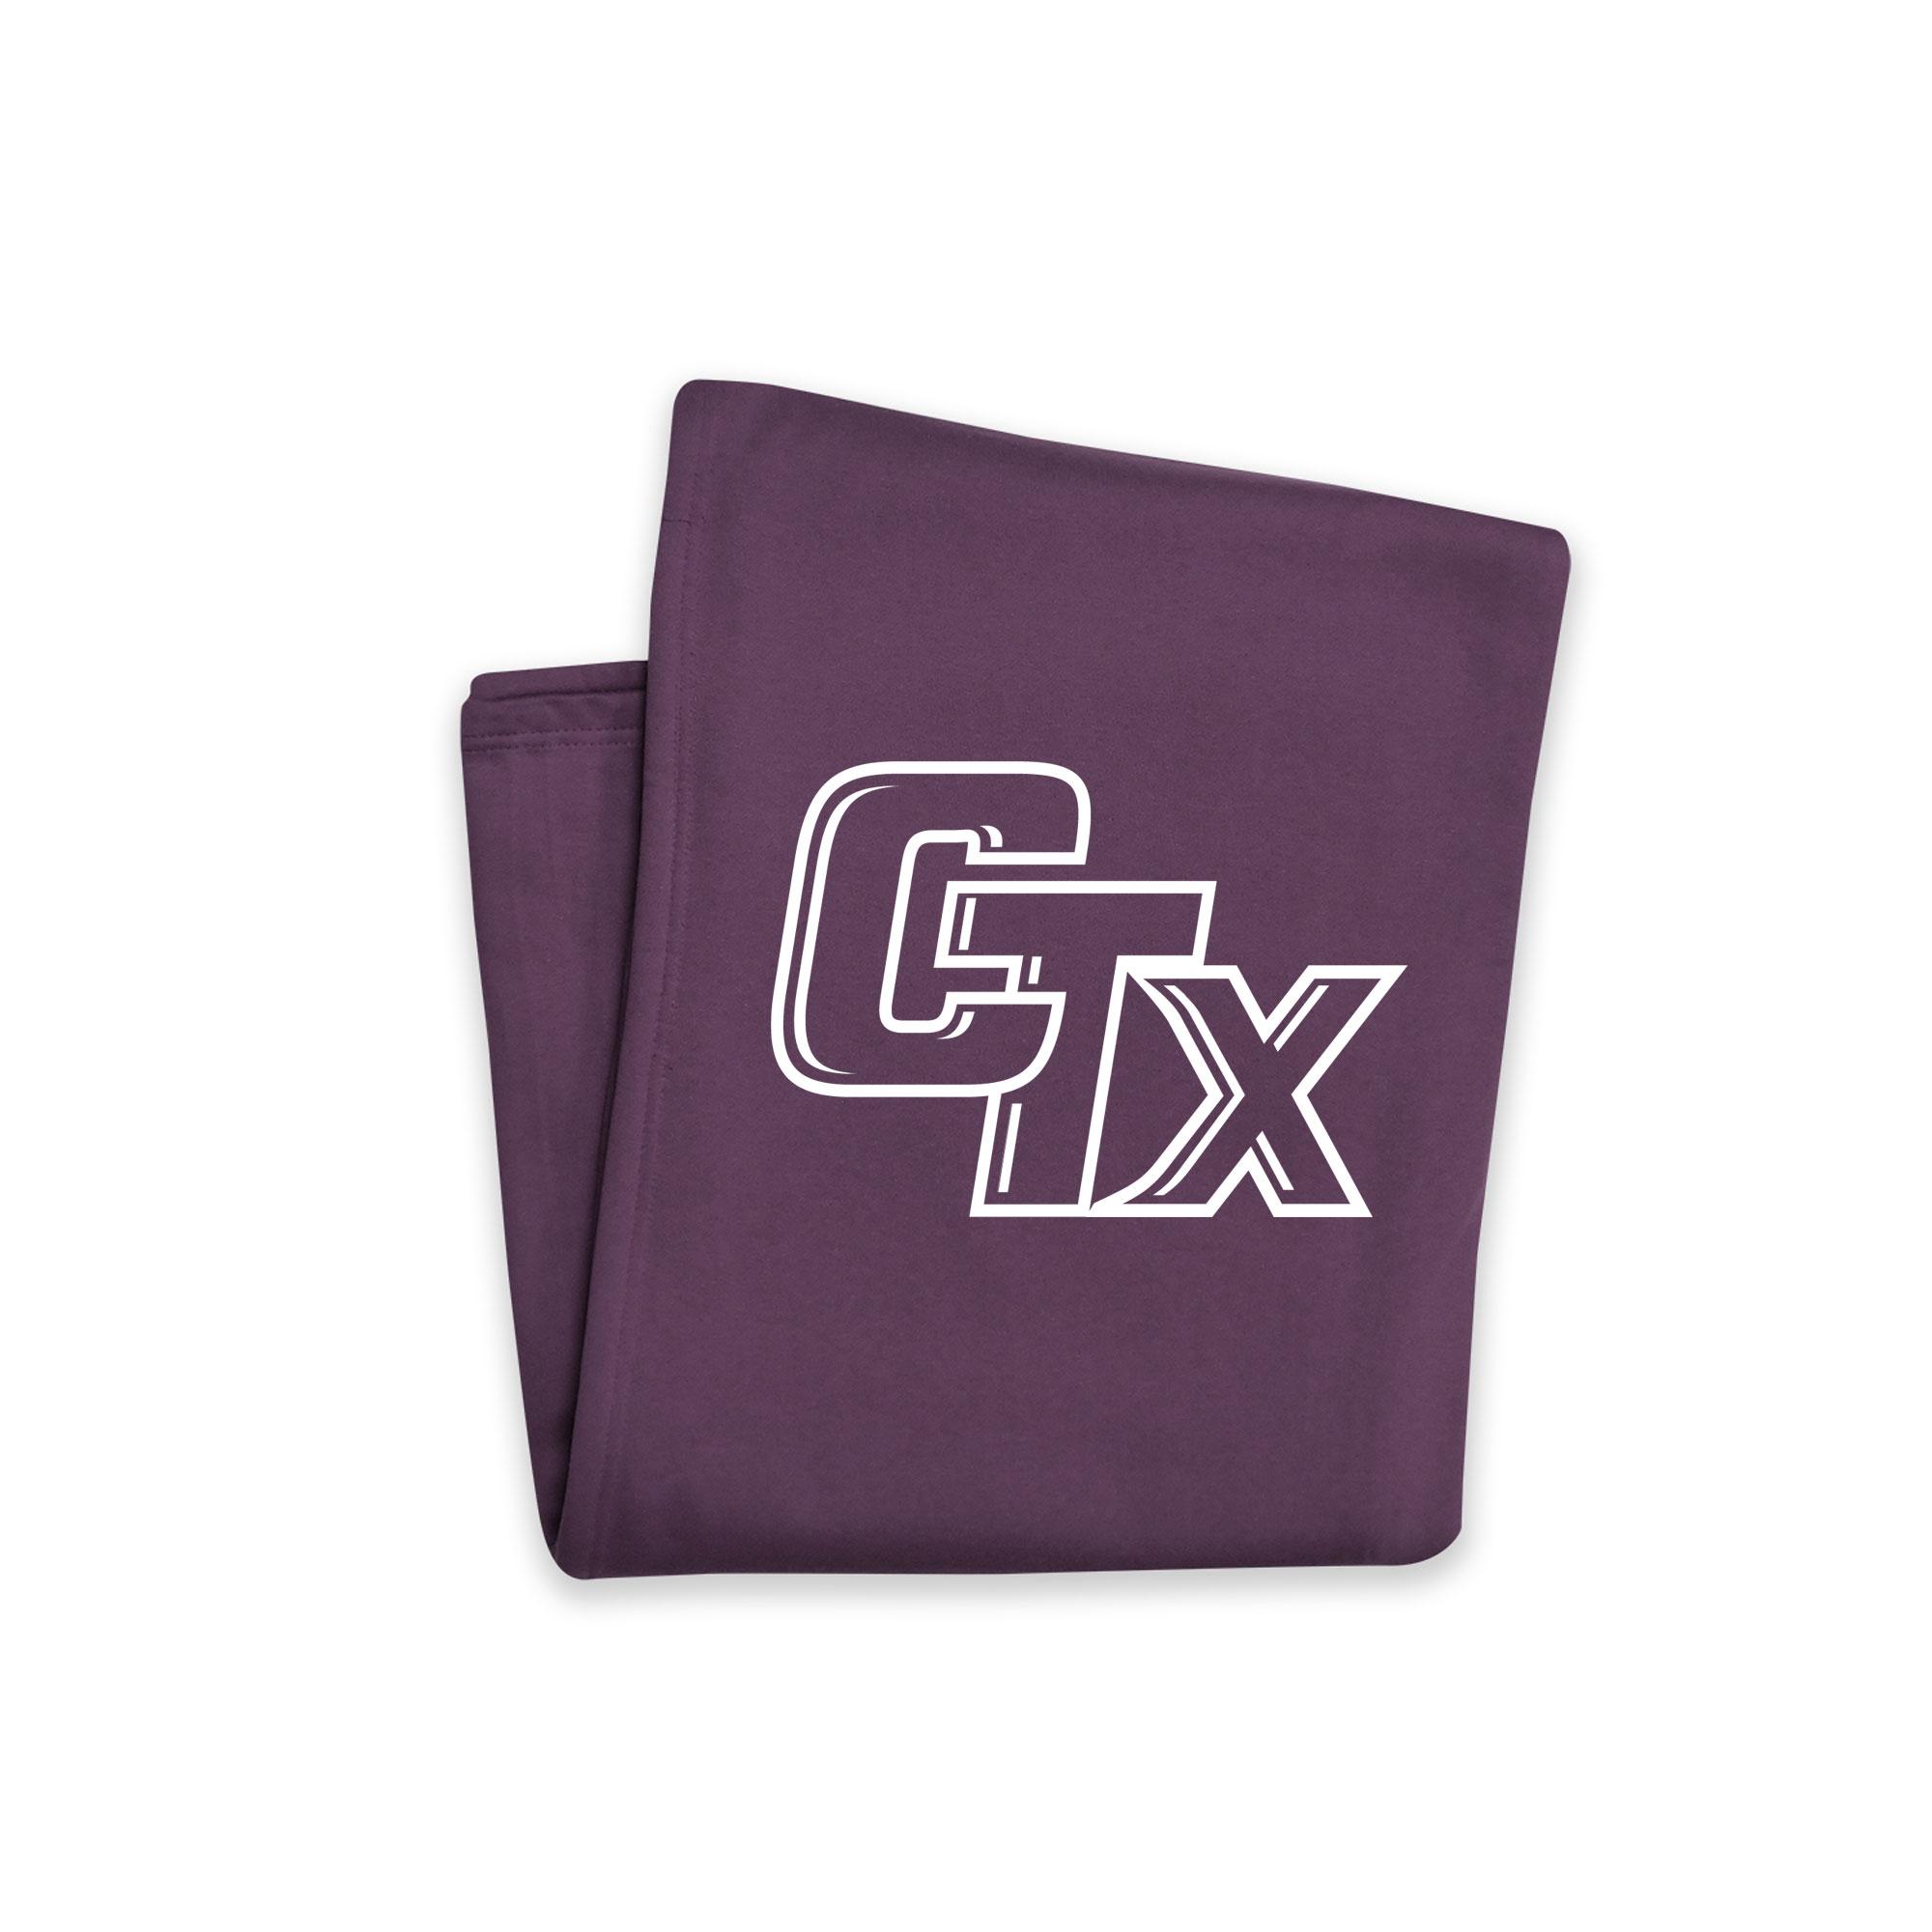 CTX Sweatshirt Blanket - Vintage Purple